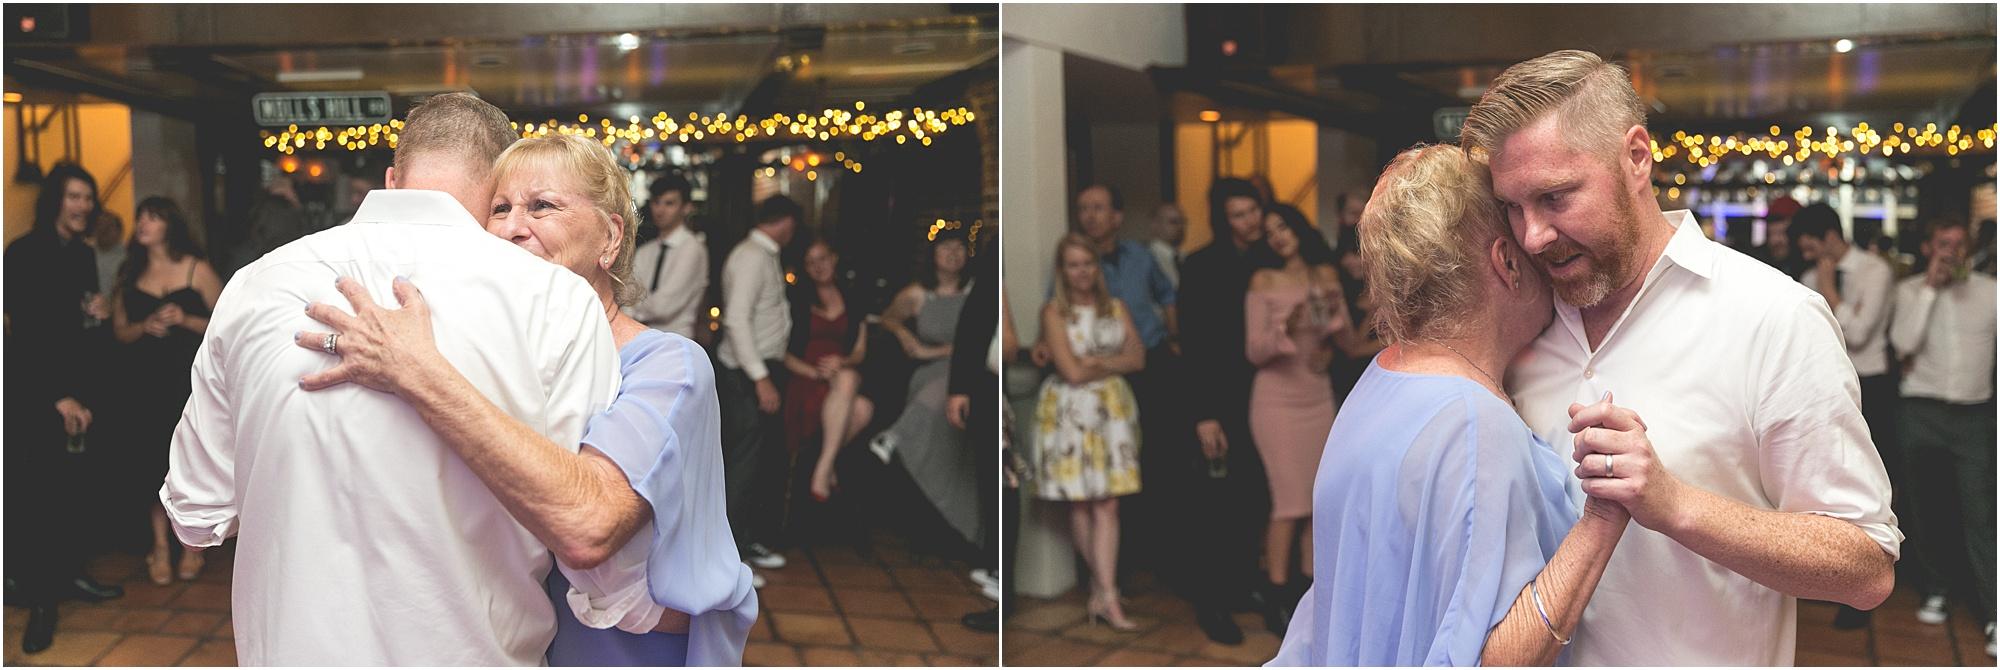 Haley Wedding Stomps 31.jpg